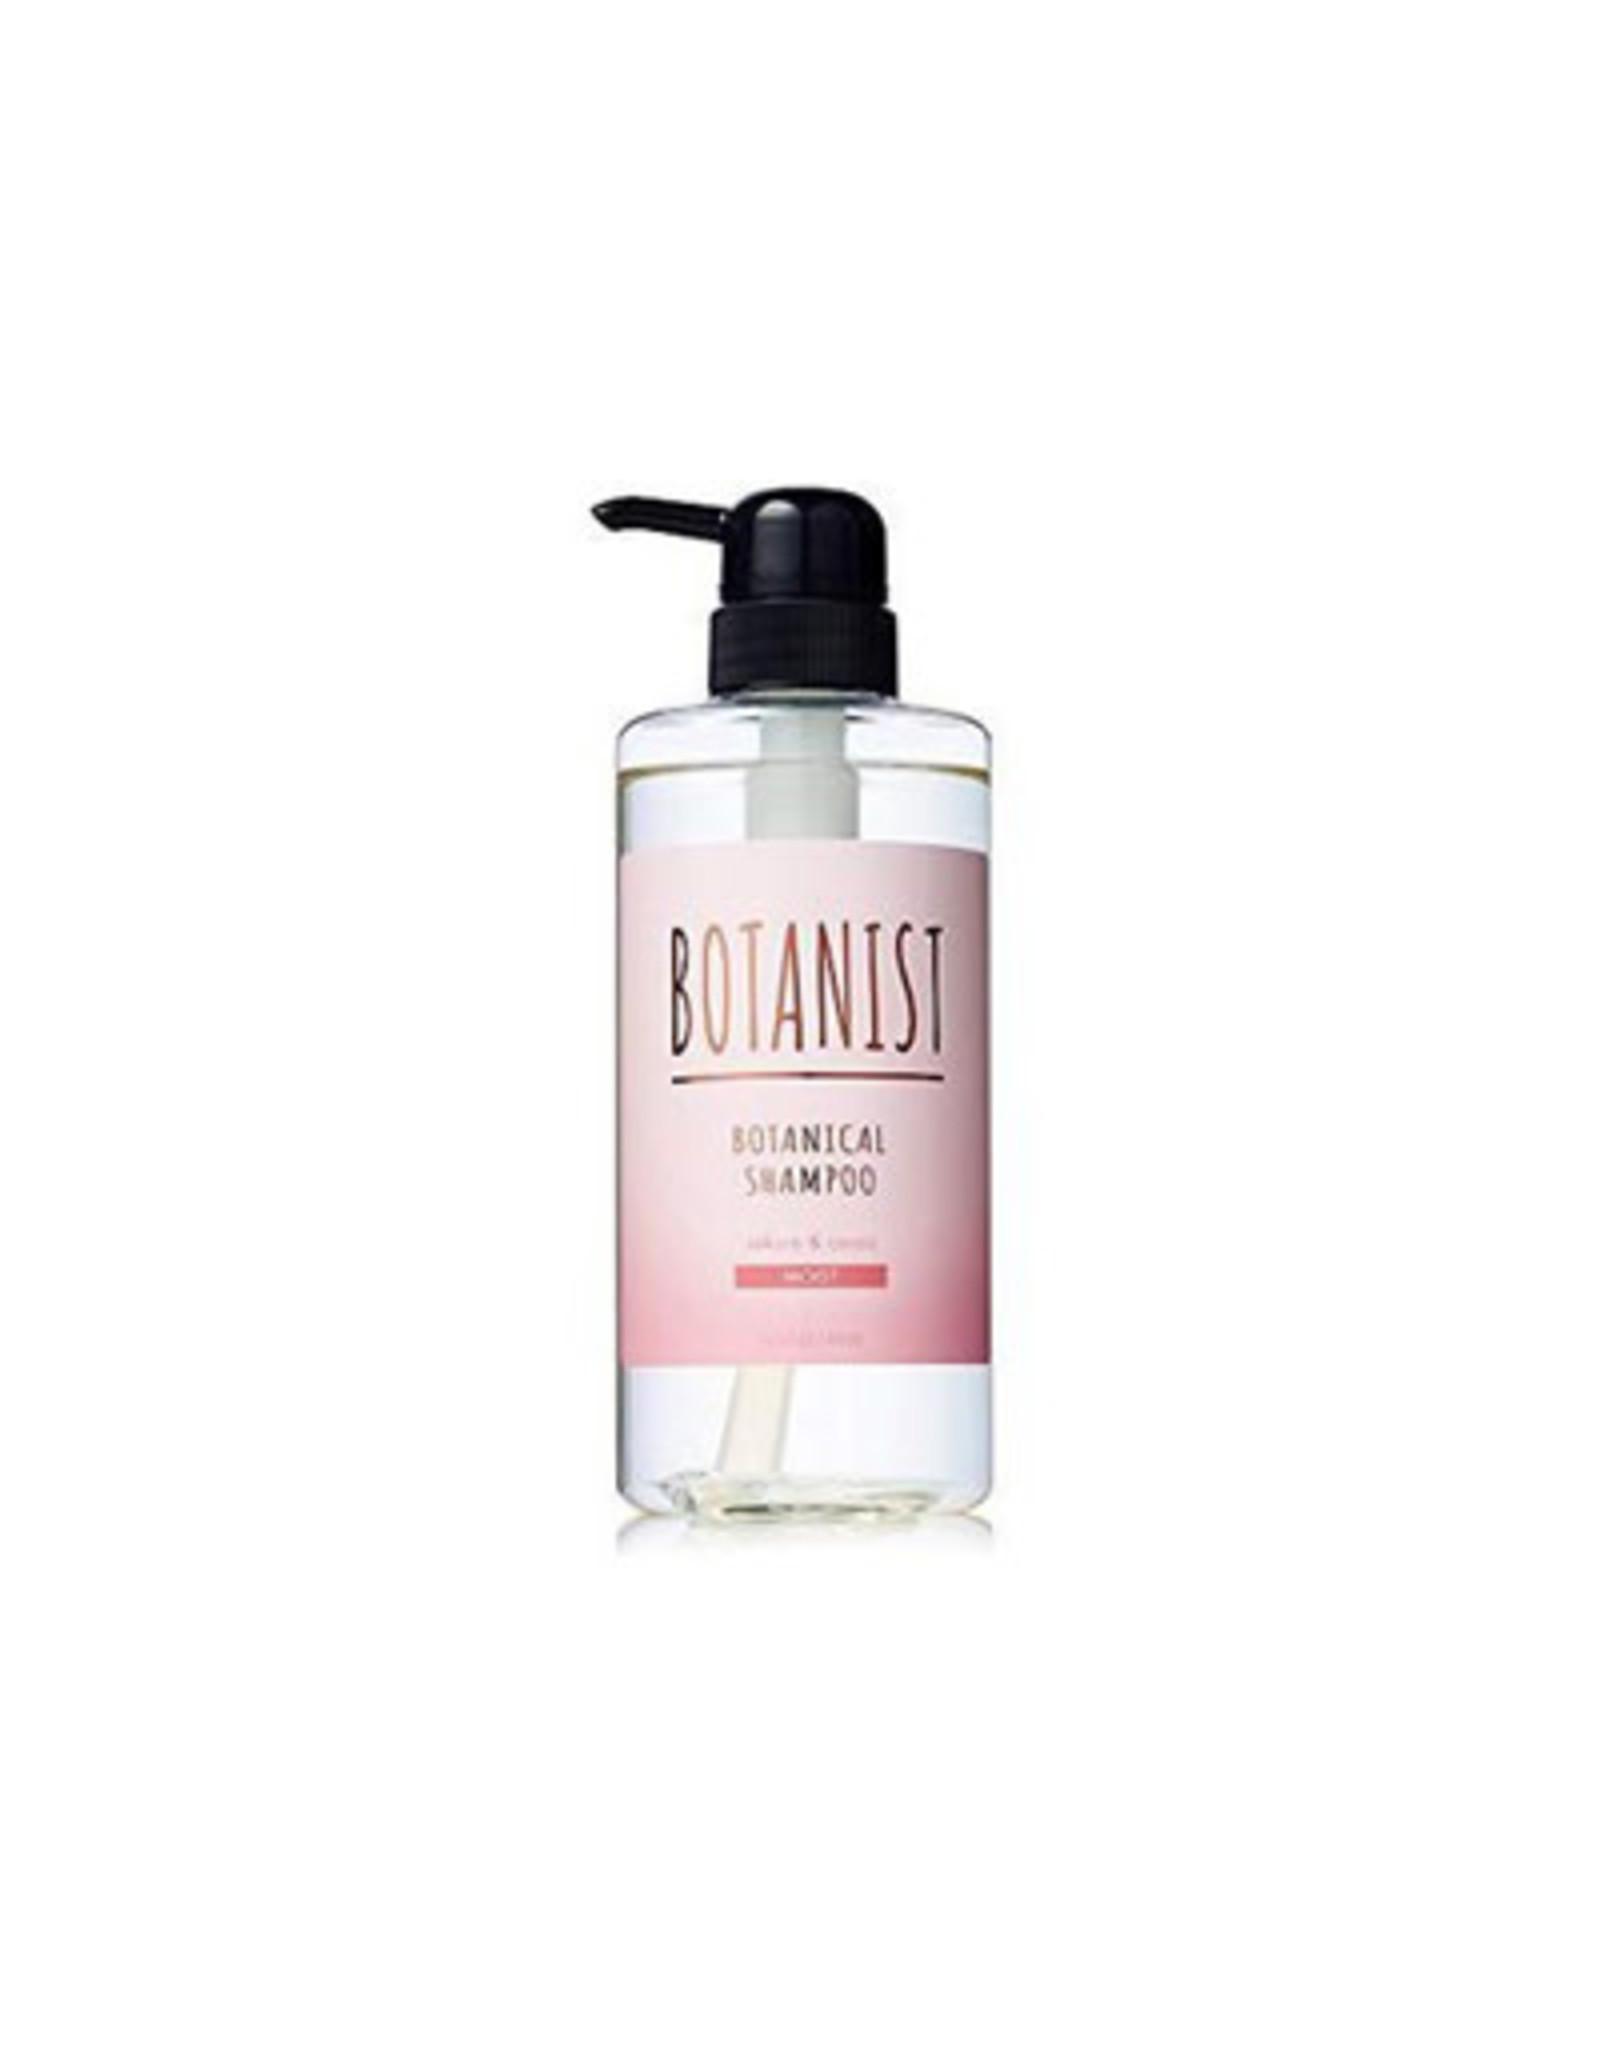 Botanist Botanist Botanical Moist Shampoo - Sakura & Cassis